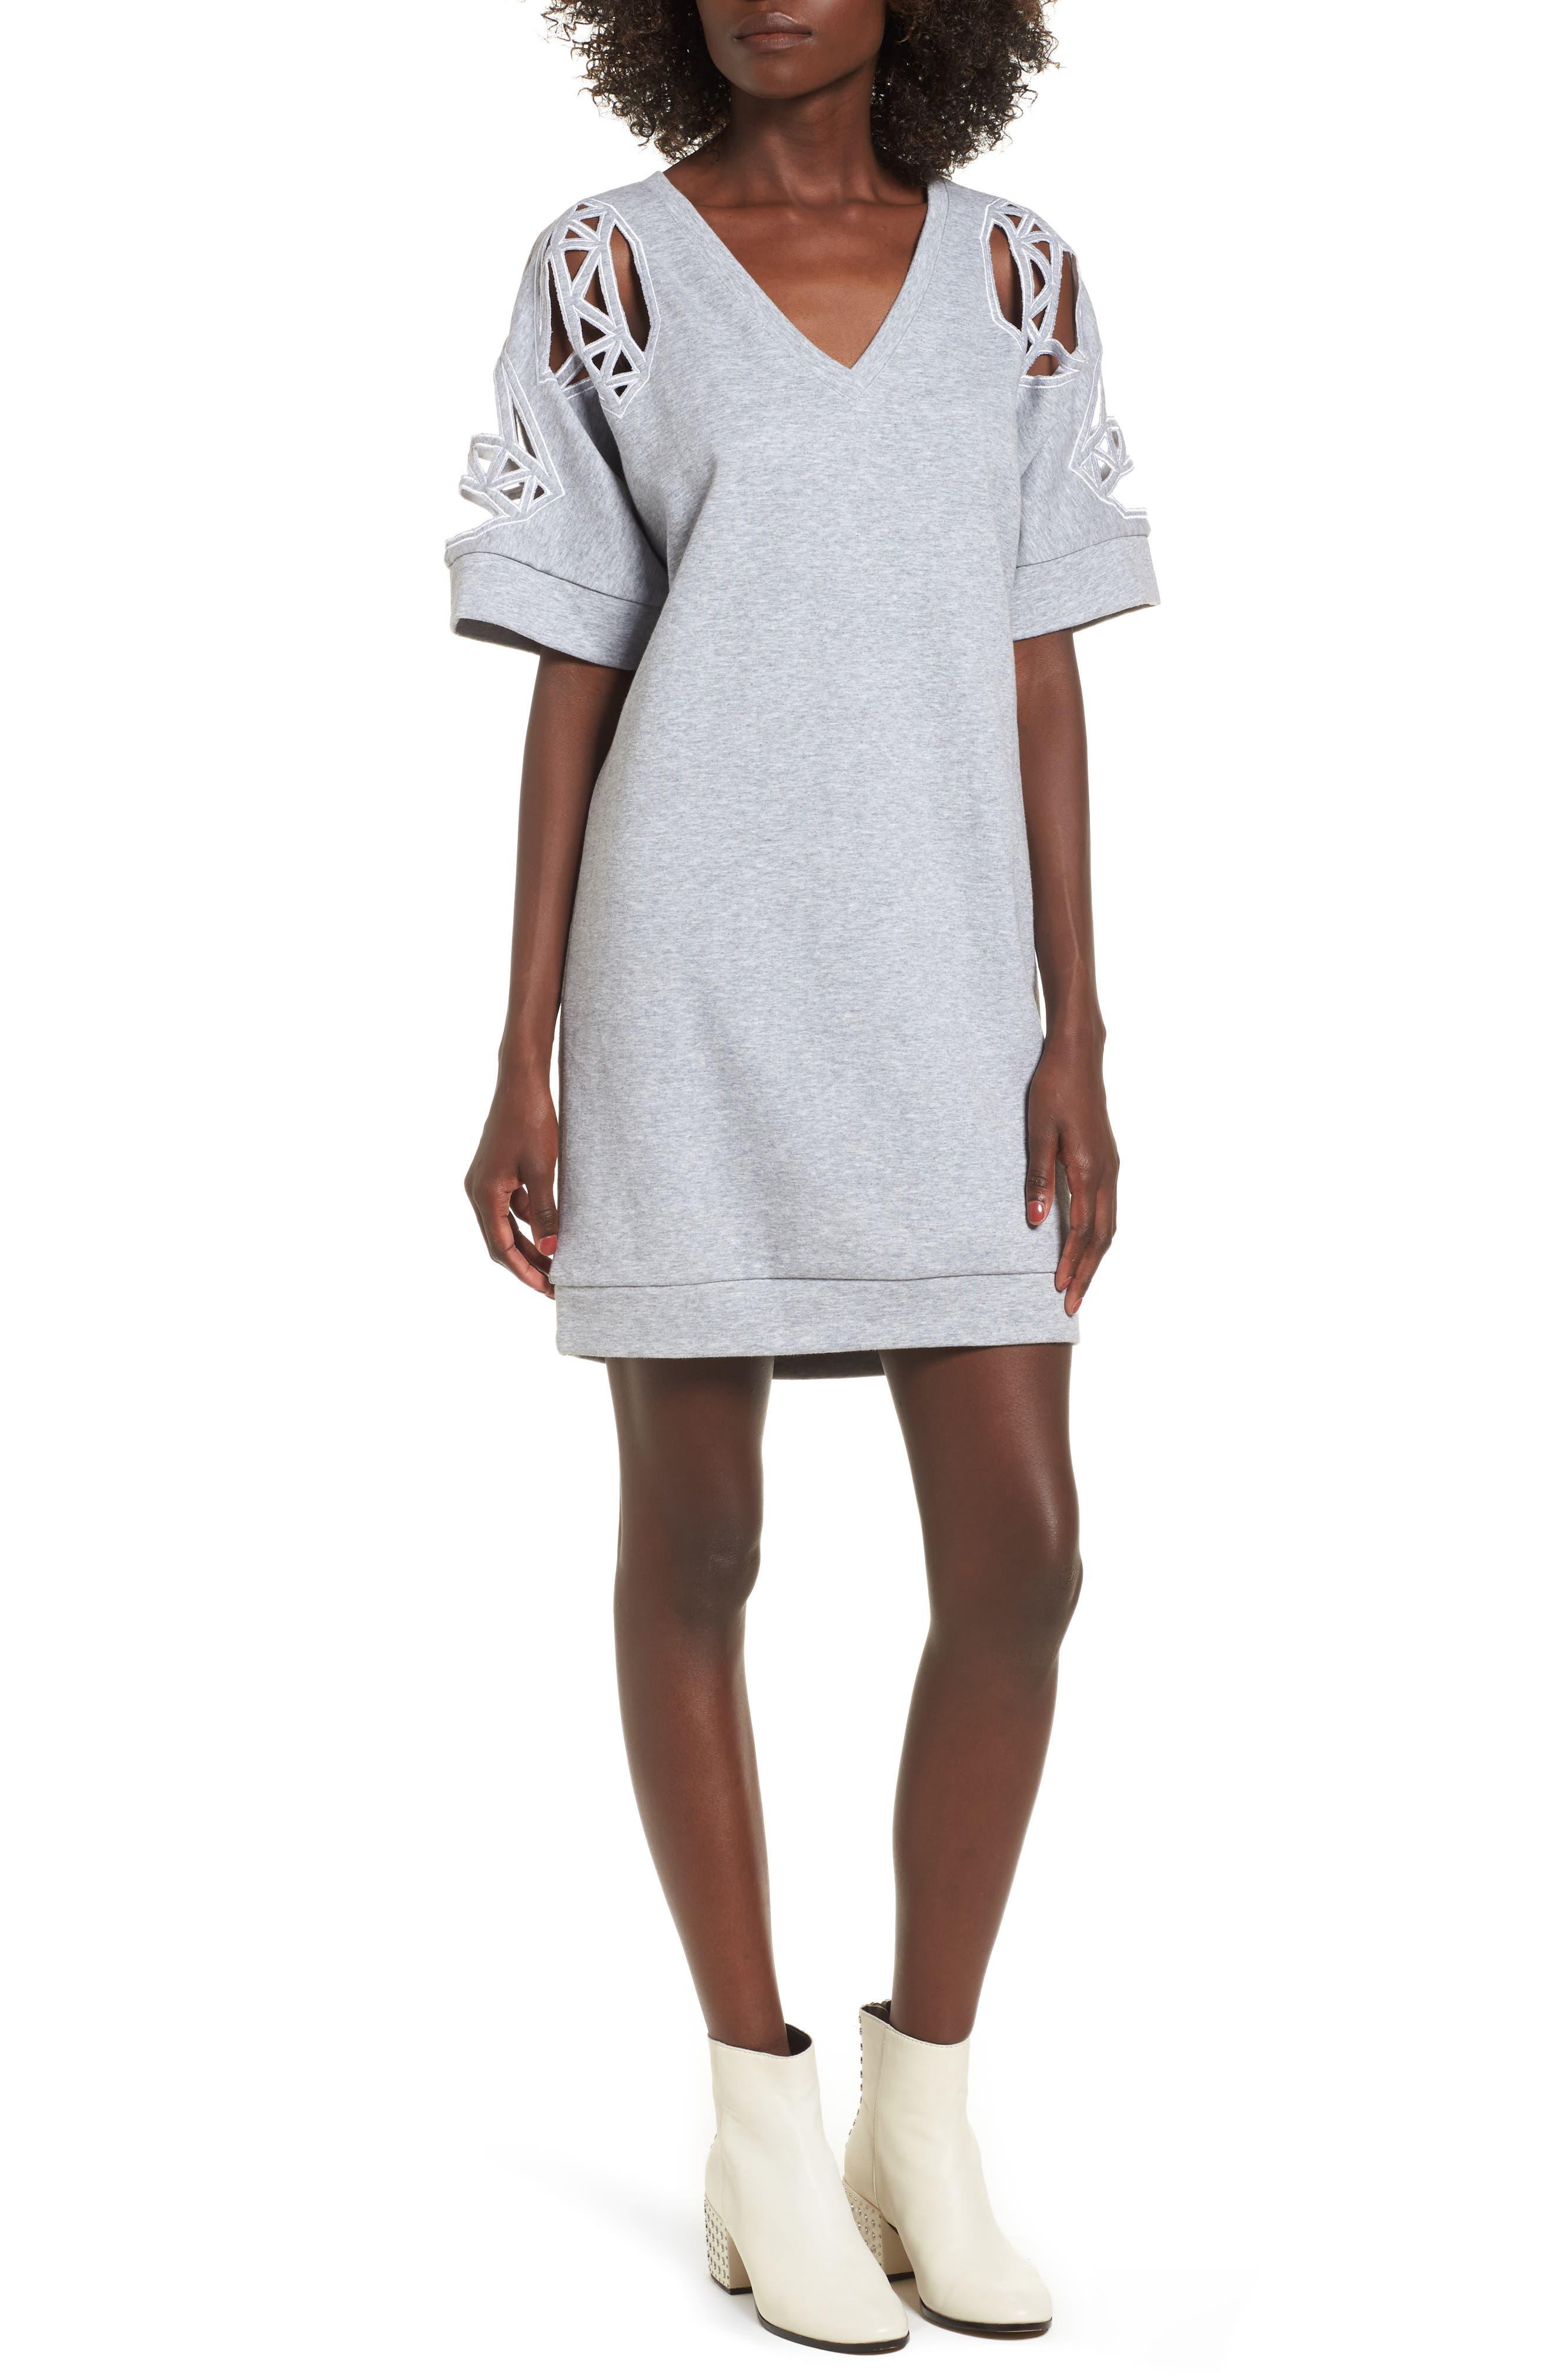 Daffic Sweatshirt Dress,                         Main,                         color, Light Grey Melange